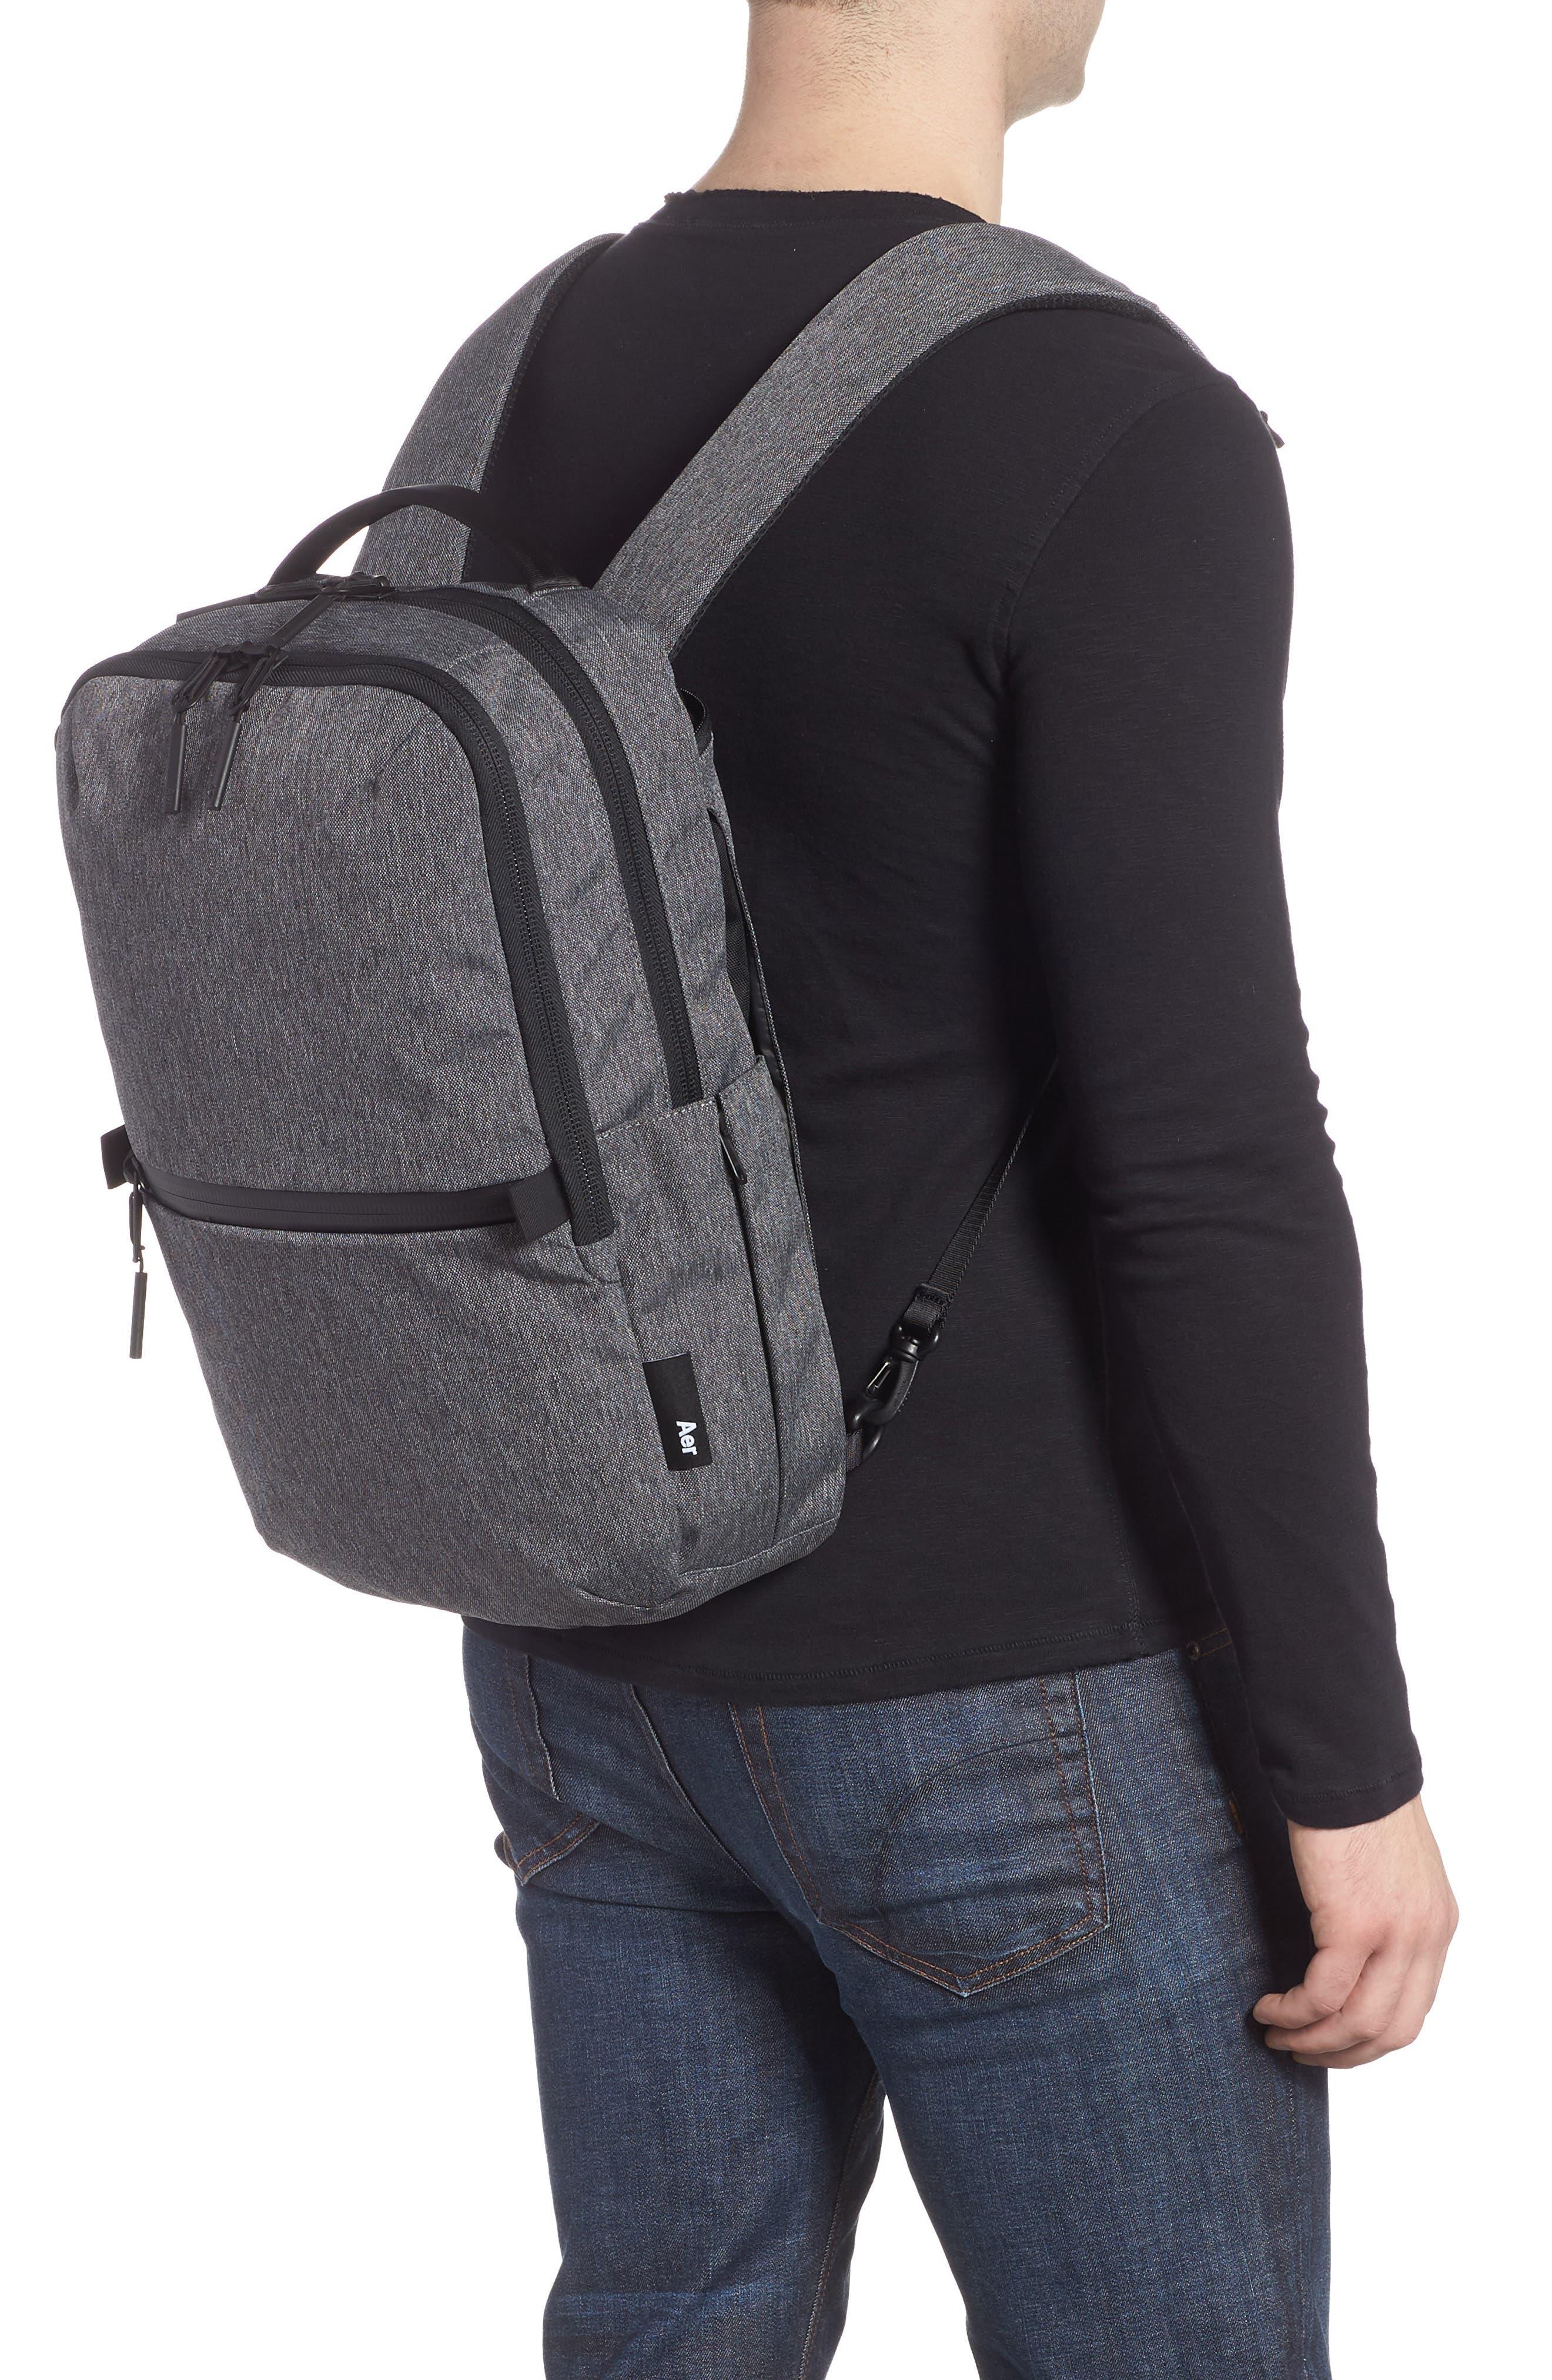 Flight Pack 2 Backpack,                             Alternate thumbnail 3, color,                             020